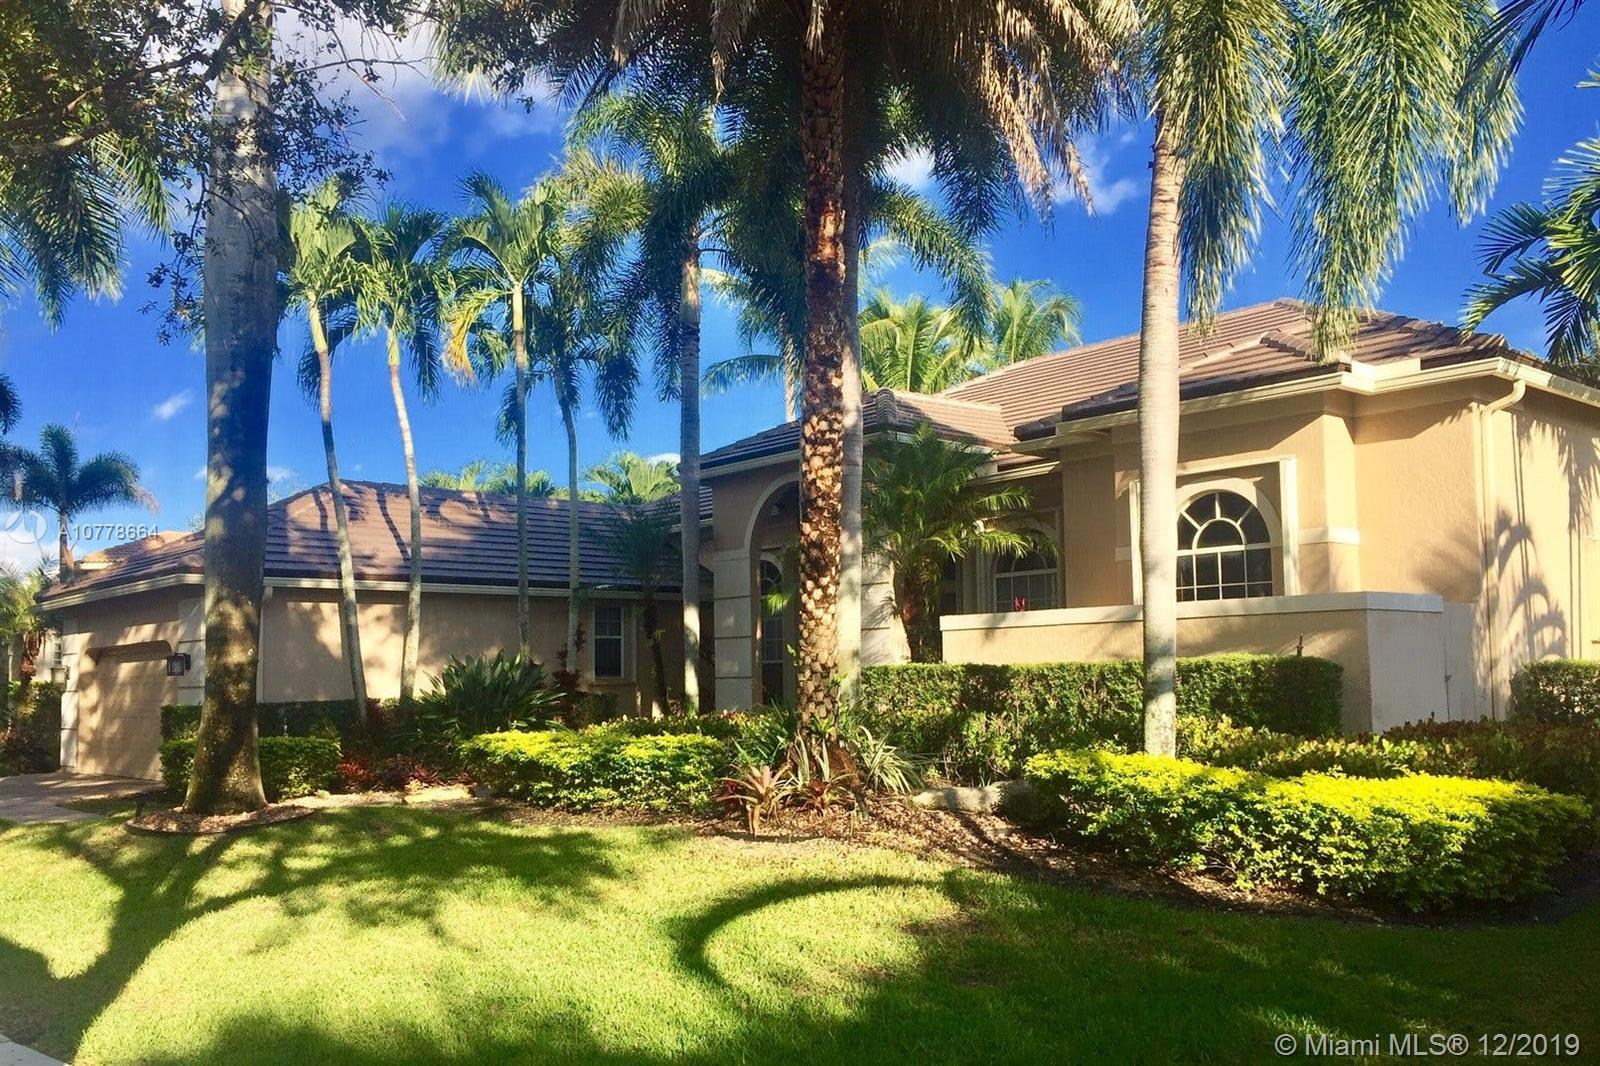 1623 Island Way, Weston, FL 33326